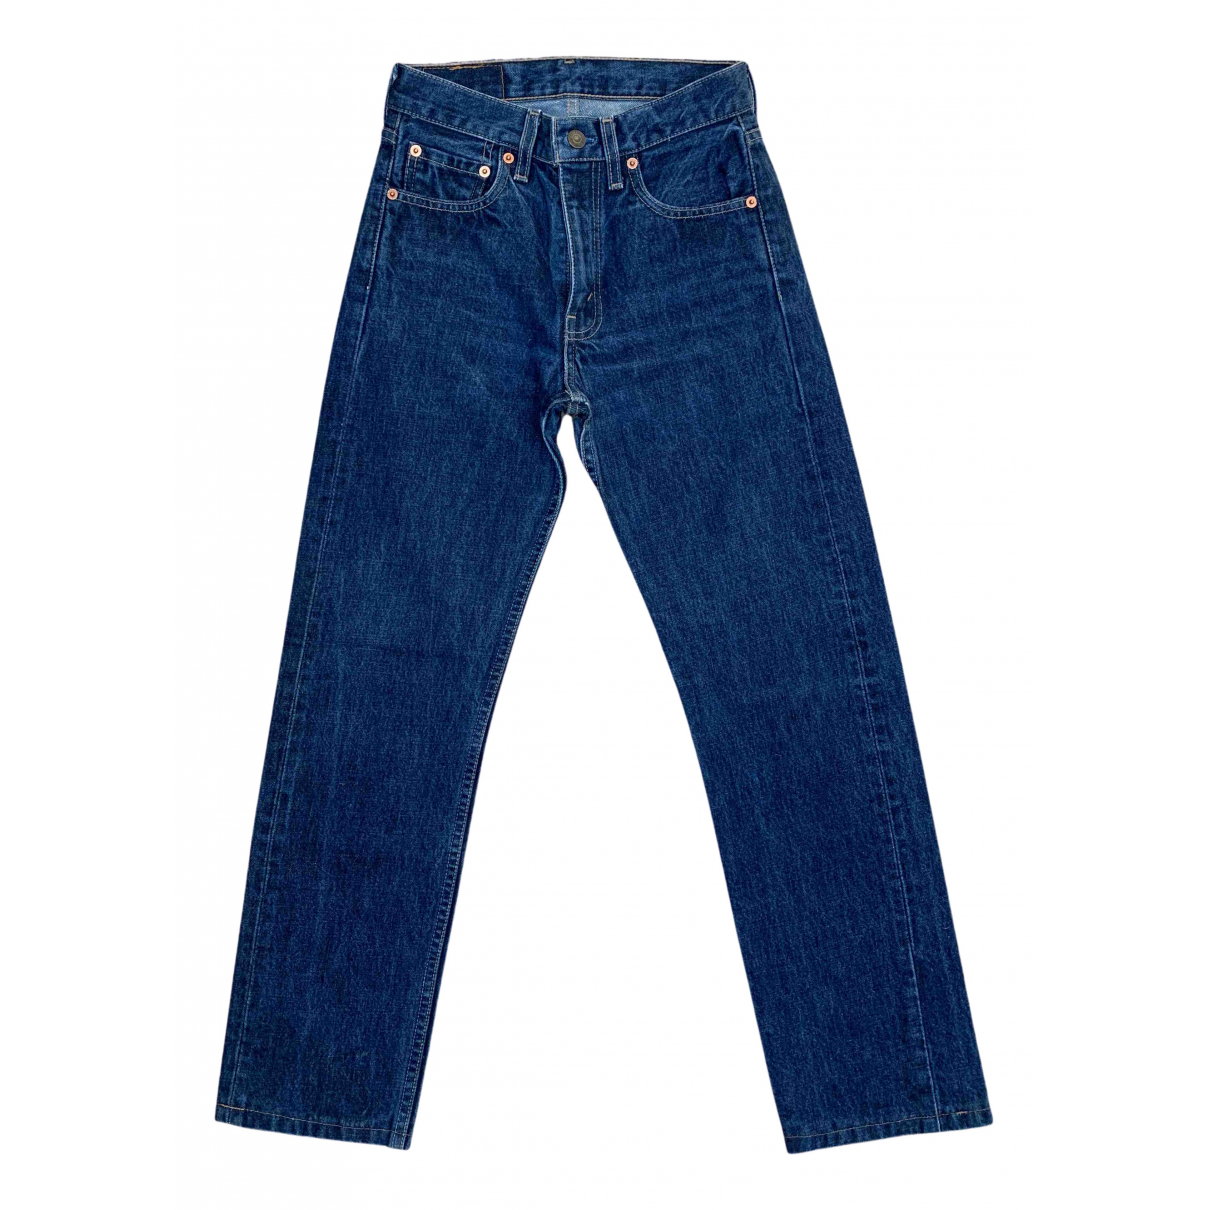 Levi's N Blue Denim - Jeans Jeans for Women 26 US